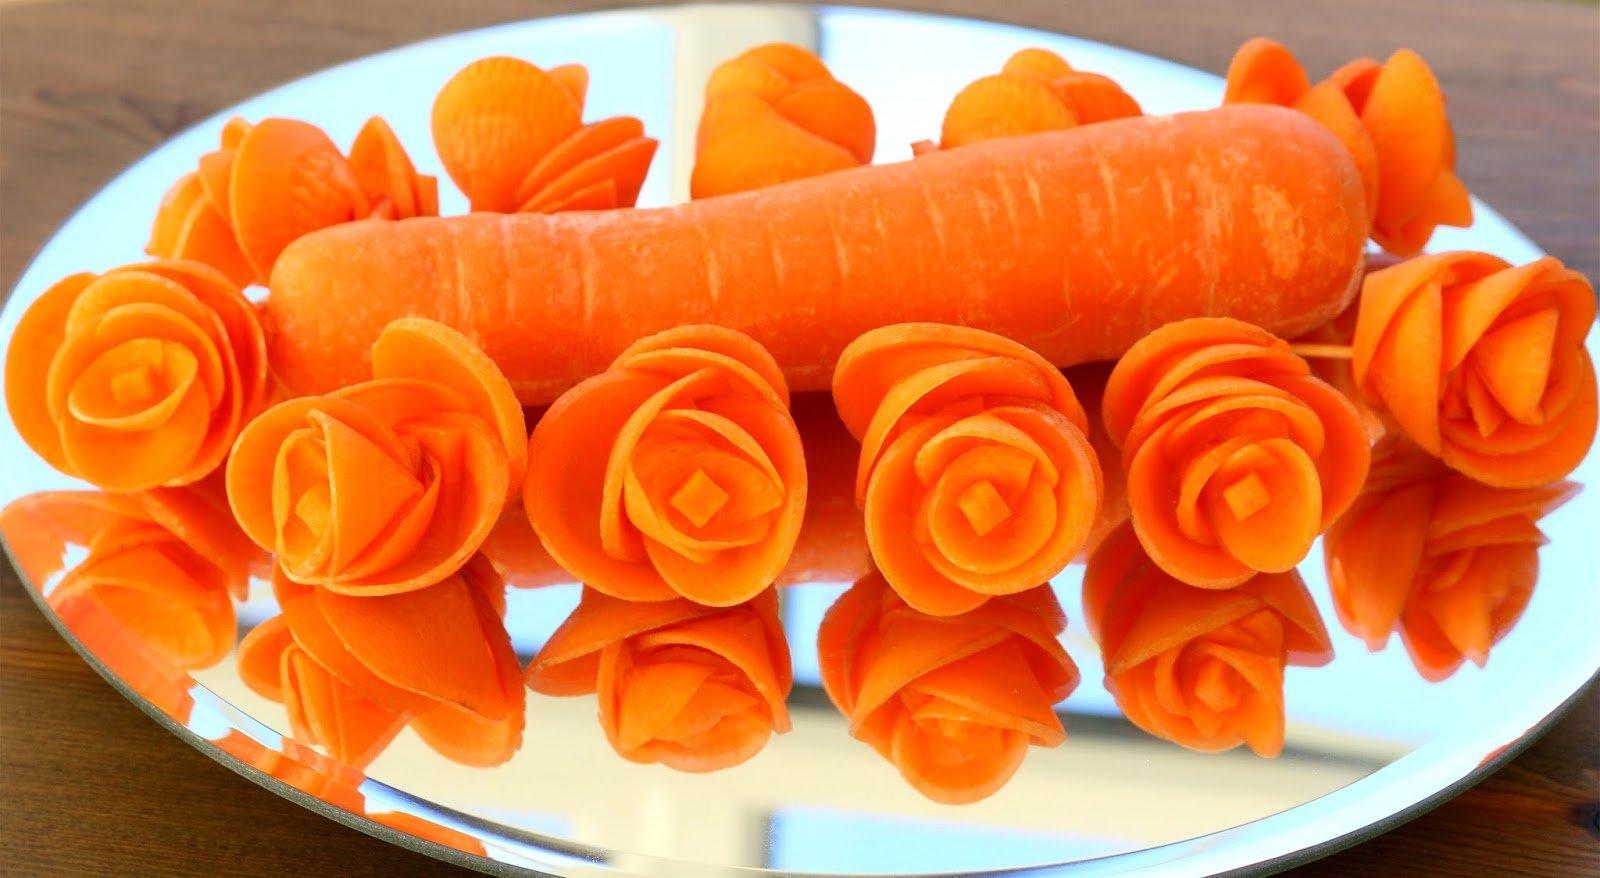 Stunning Fruit Vegetable Carving 30 Best Food Art Sculptures